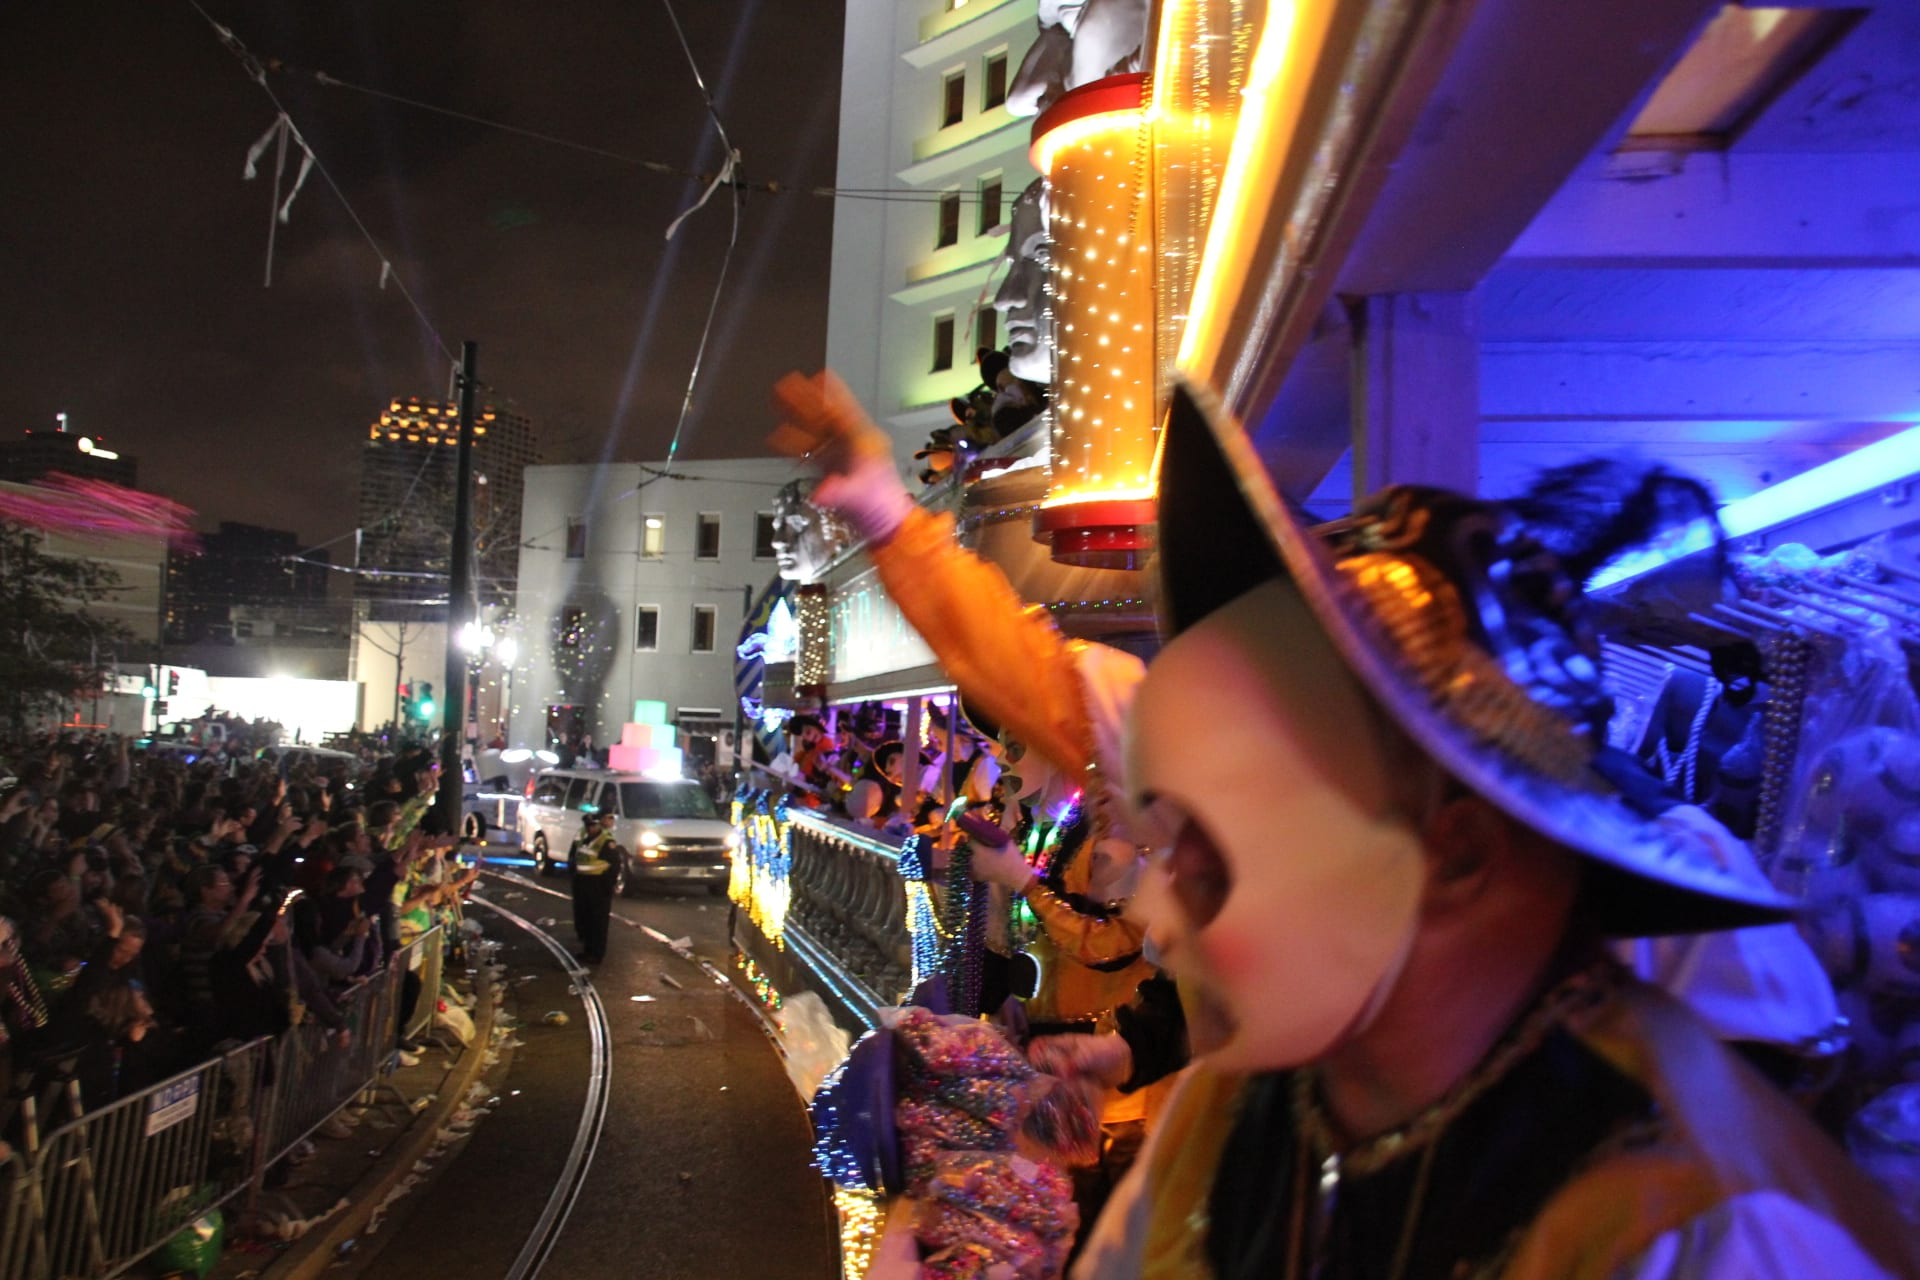 Endymion New Orleans Mardi Gras